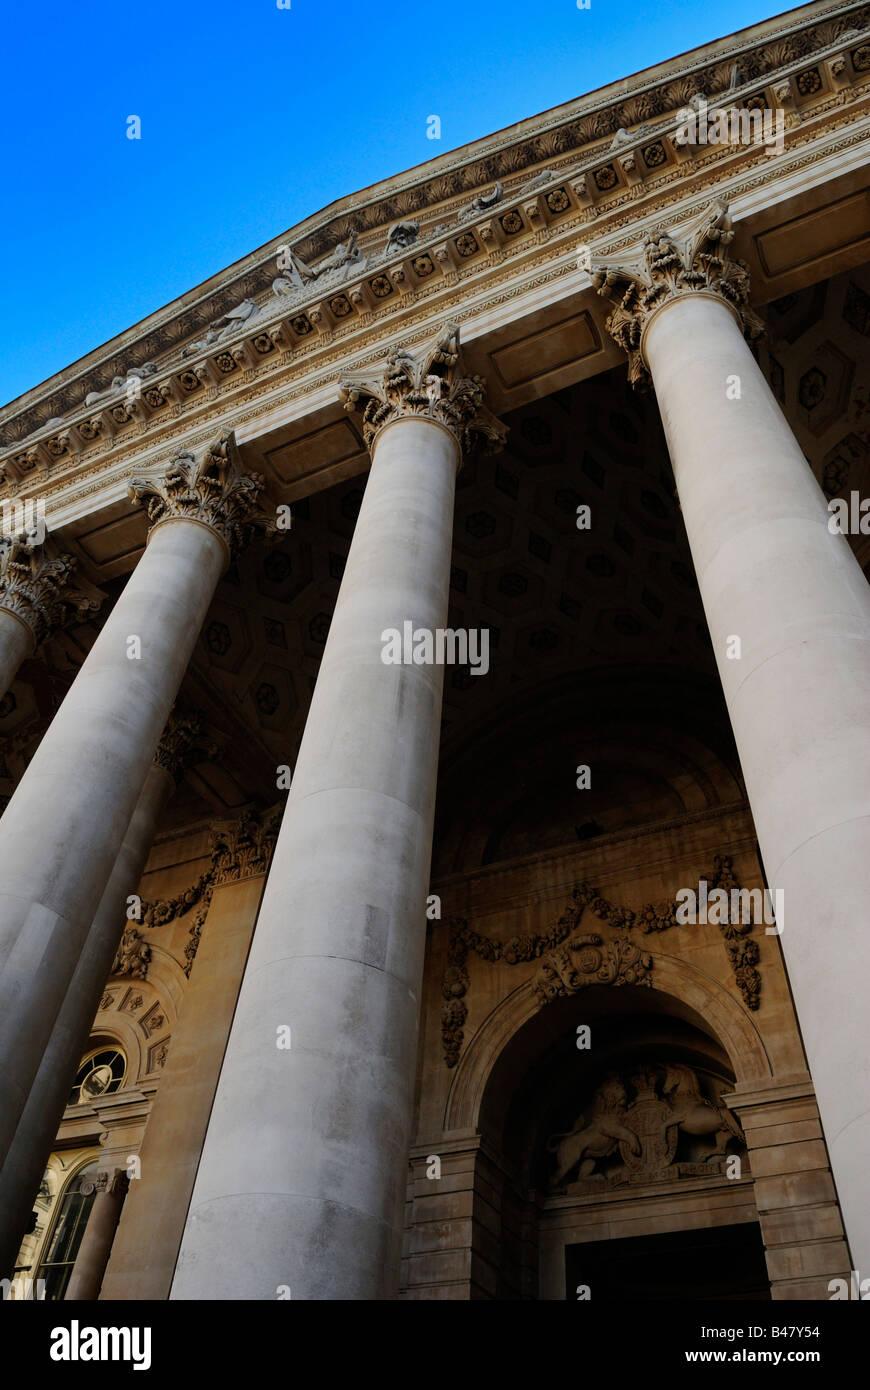 The Royal Exchange London Britain Stock Photo